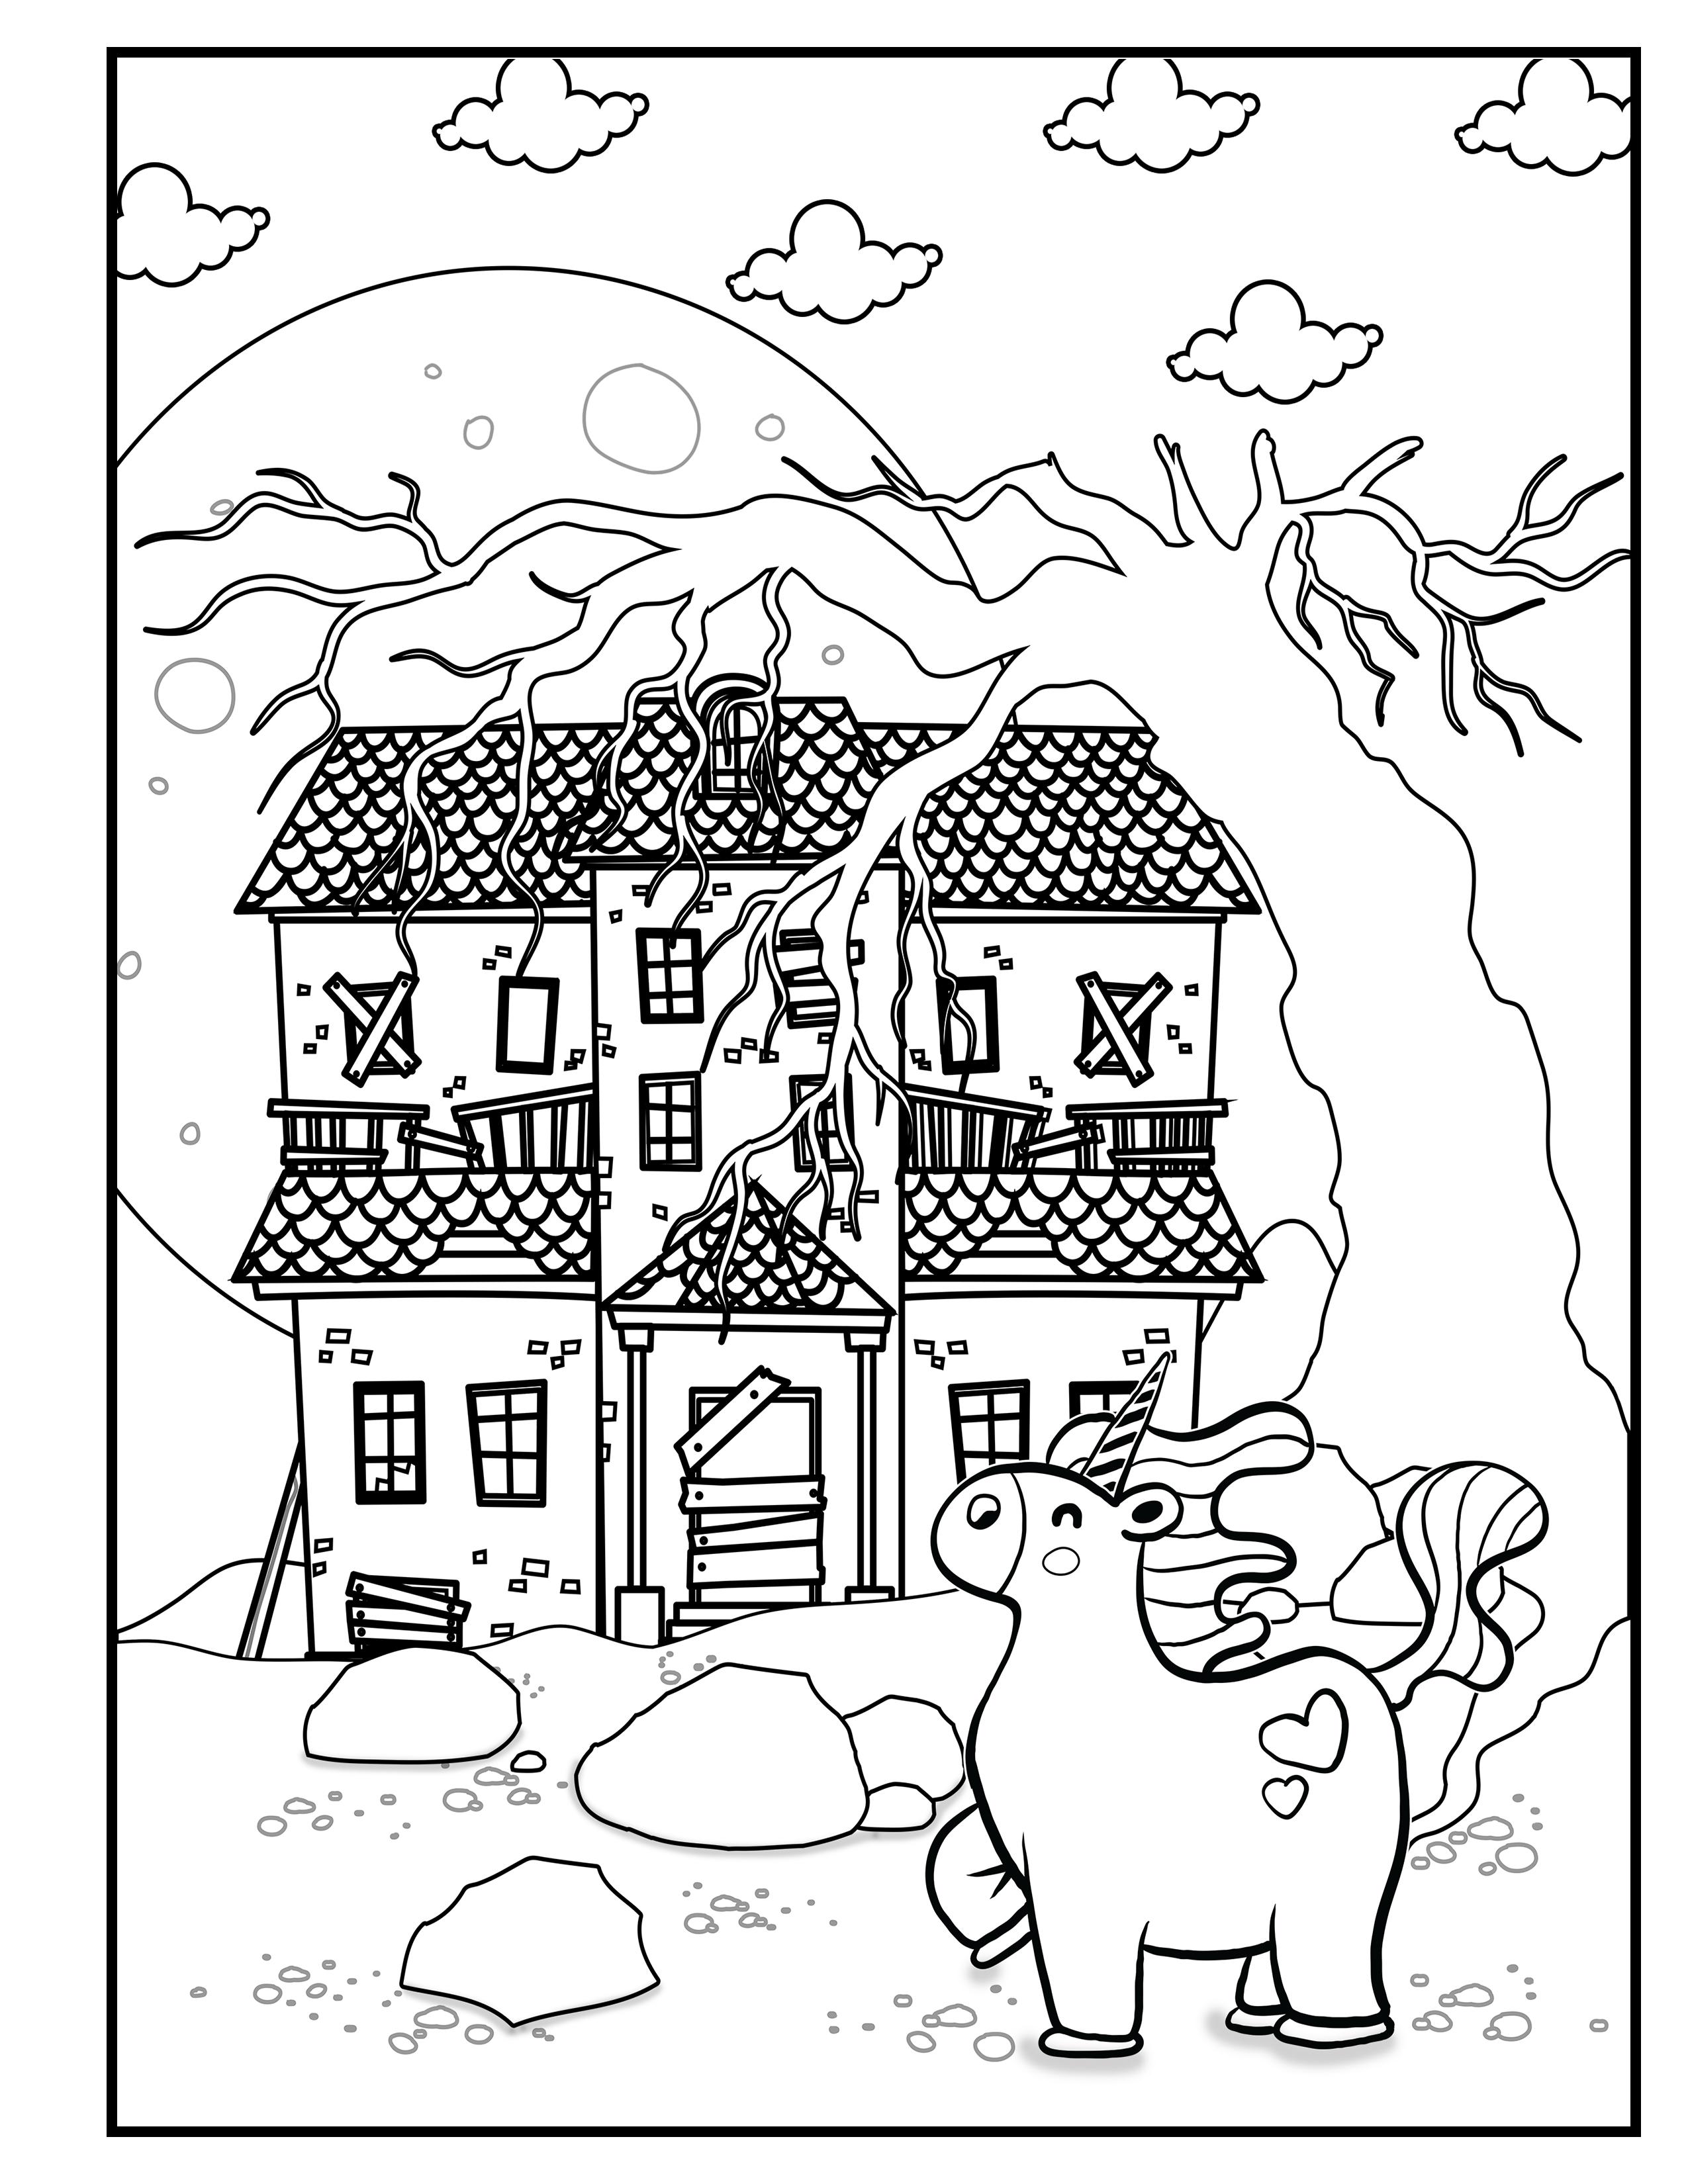 Unicorn Guards Creepy House Unicorn Halloween Unicorn Coloring Book For Kids Image 22 Coloring Books Halloween Coloring Book Coloring Pages For Boys